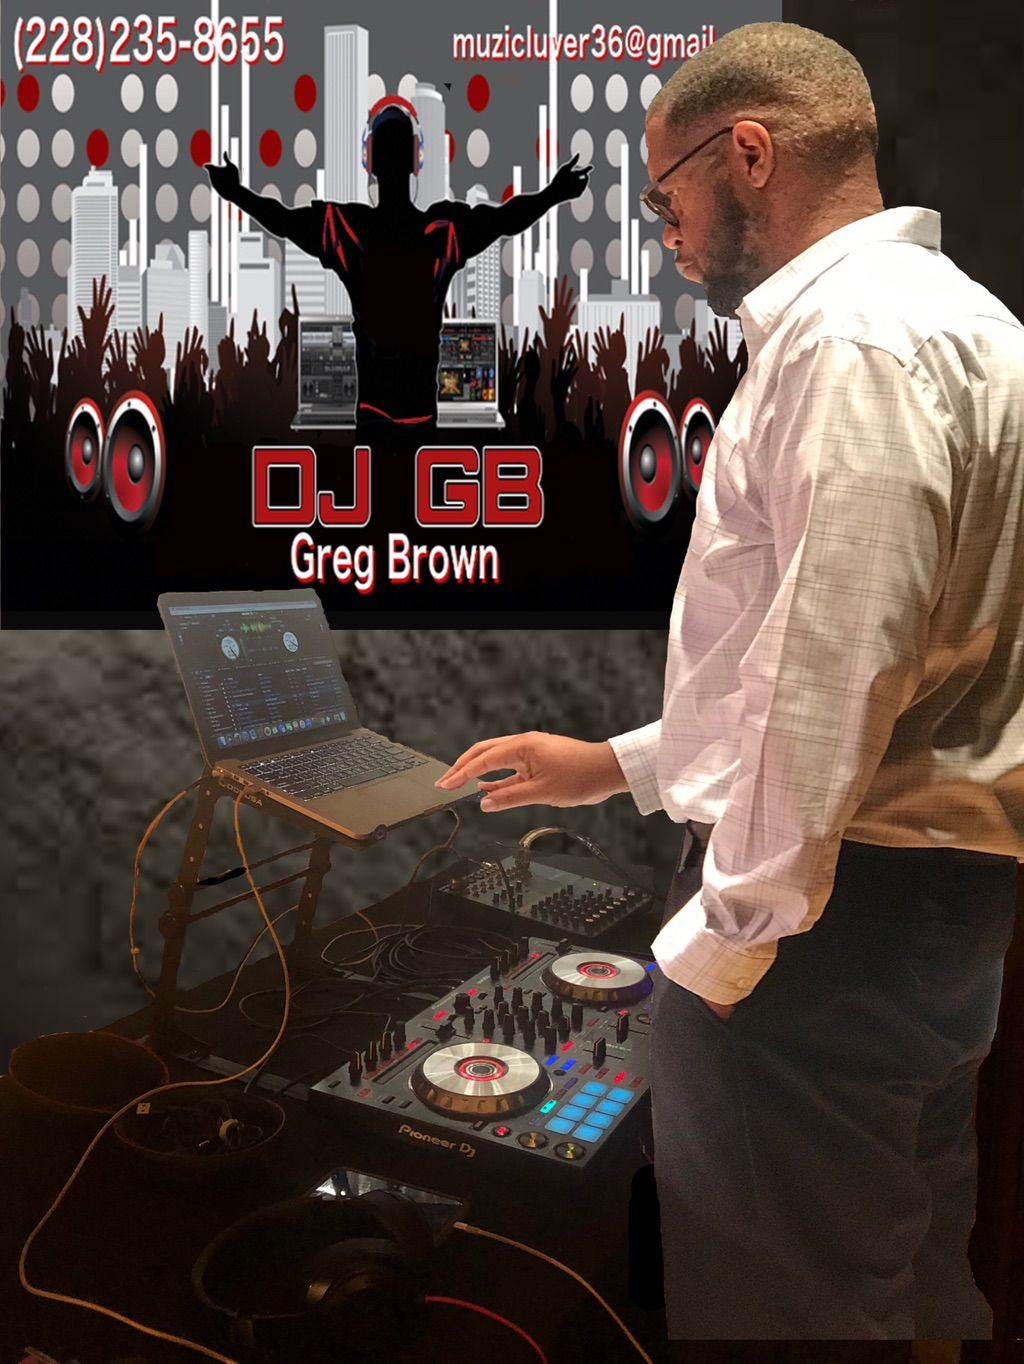 DJ GB